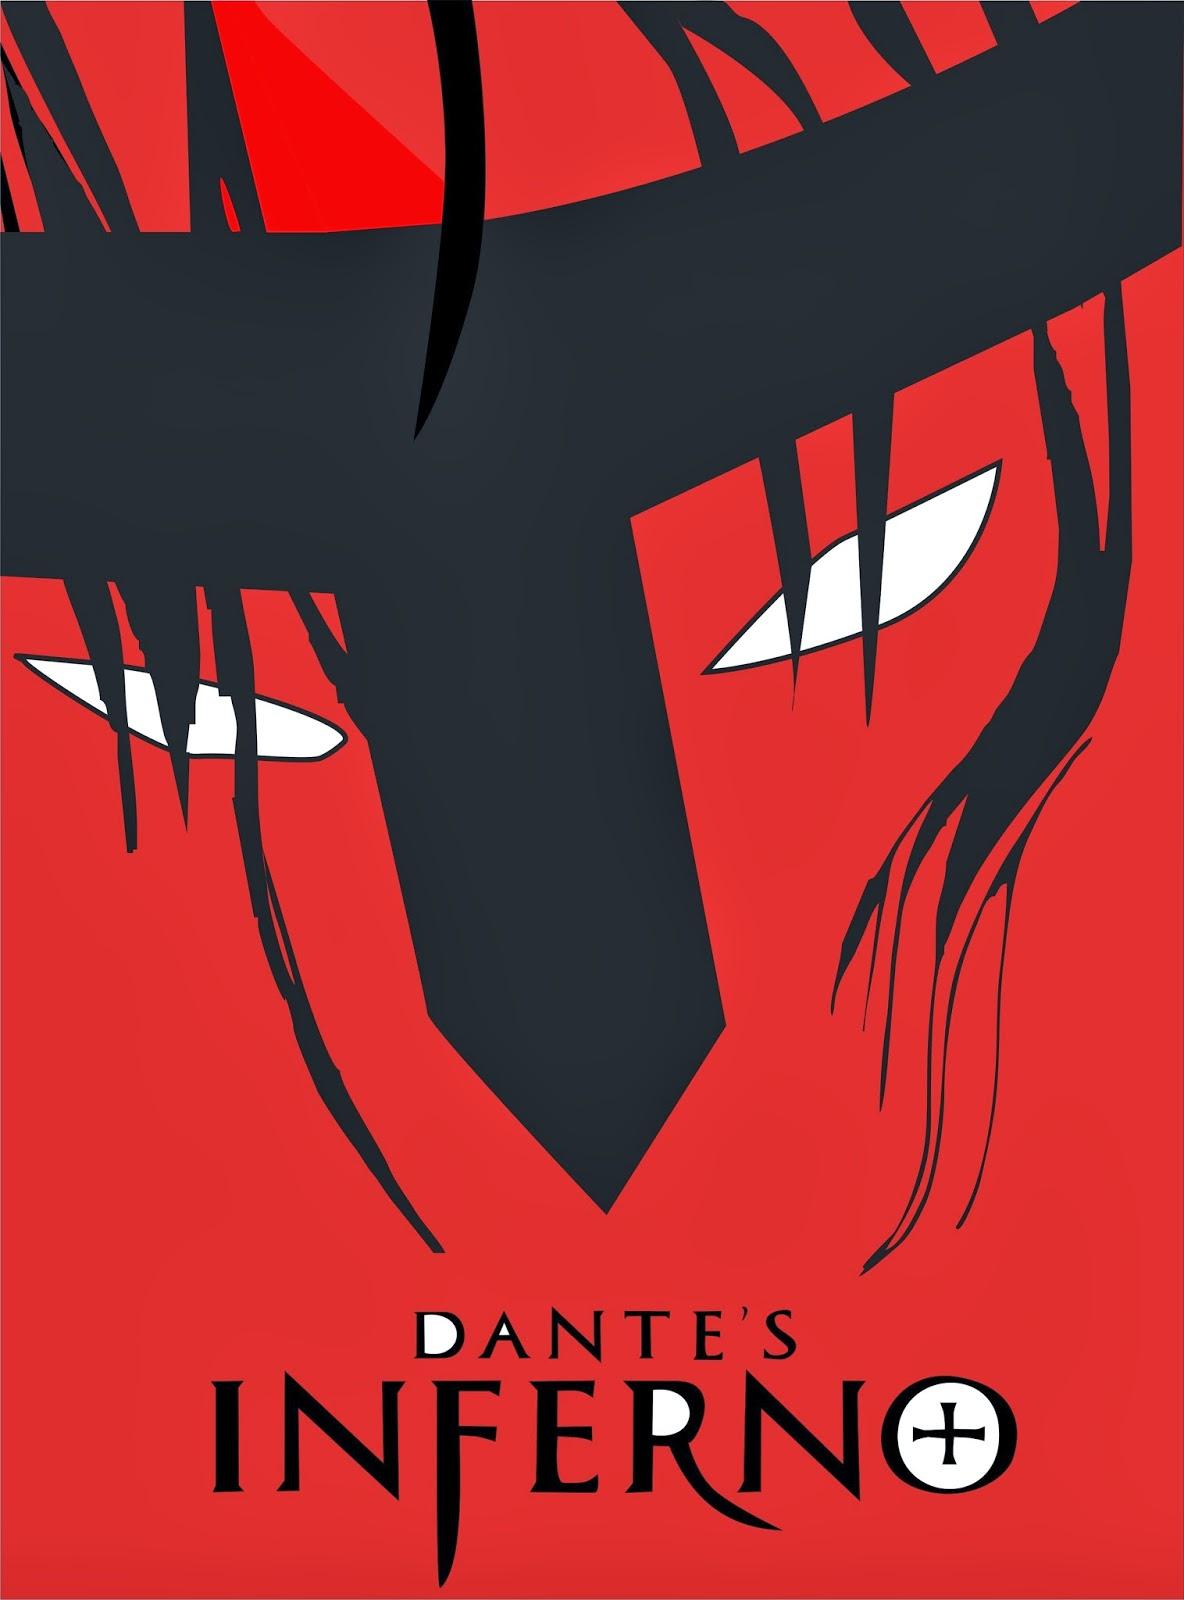 dantes inferno essay Essays and criticism on dante alighieri's dante's inferno - critical essays.